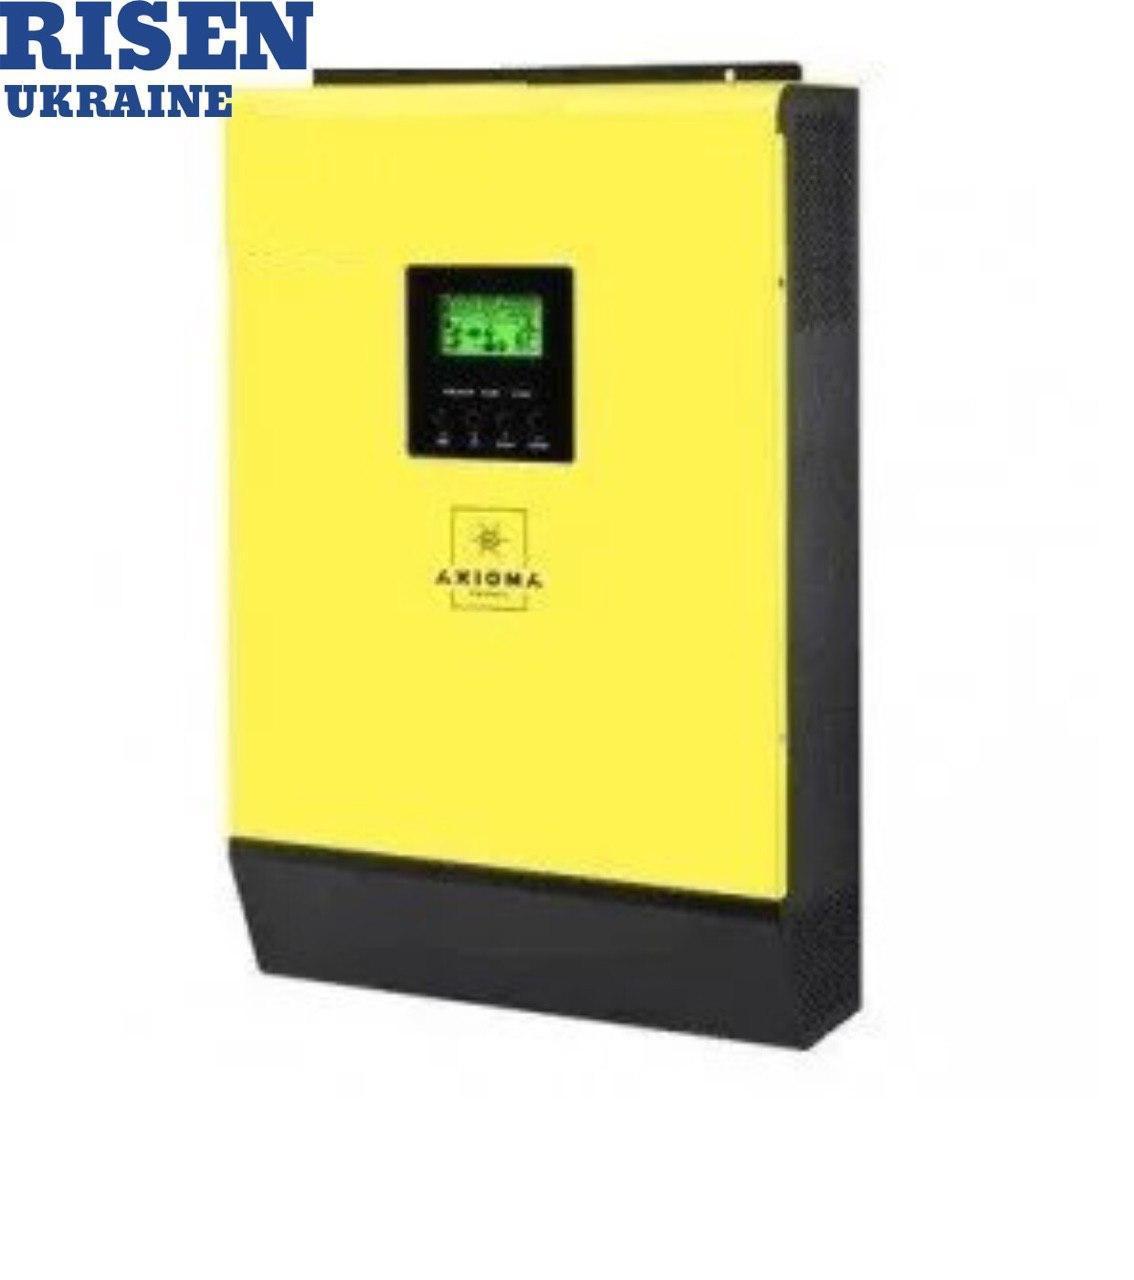 Інвертор напруги гібридний AXIOMA energy - ISGRID 4000 4кВт 1 фаза 1МРРТ